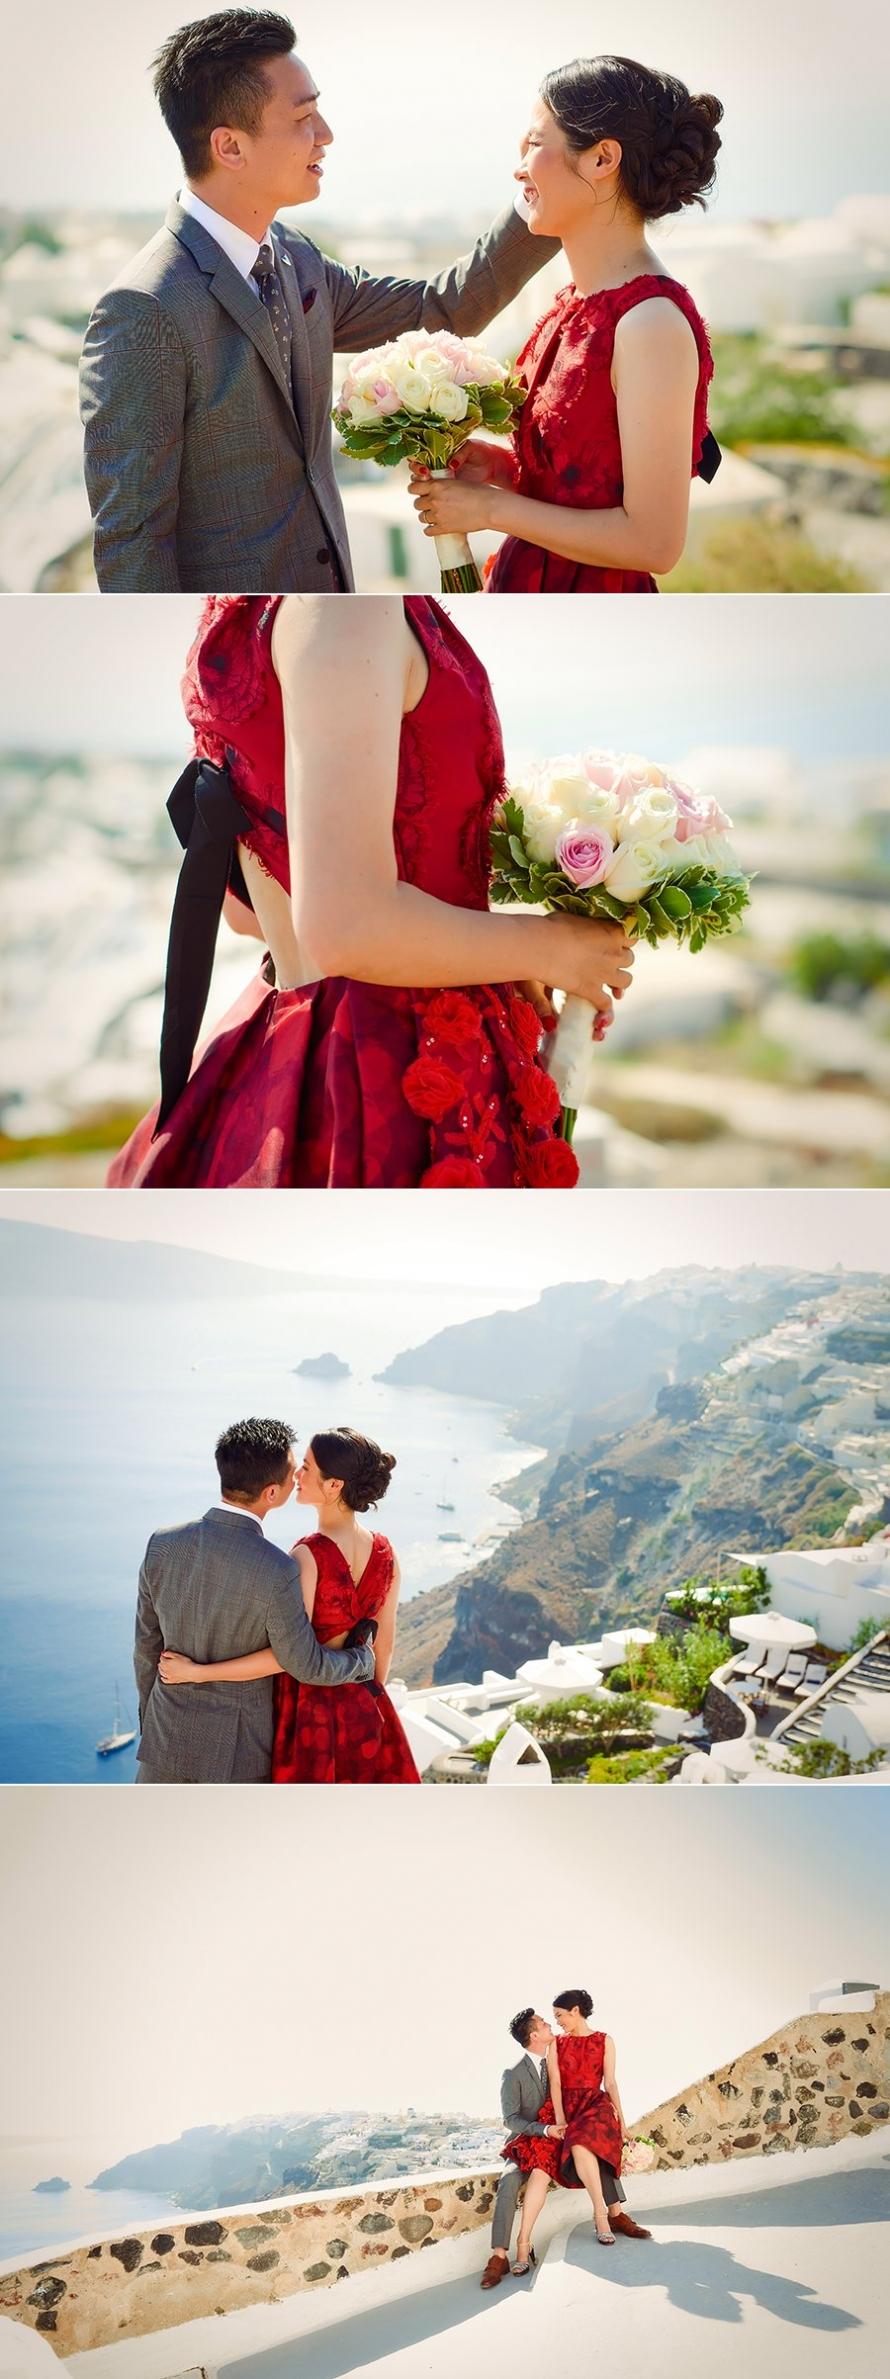 Omi Lili wedding photo02